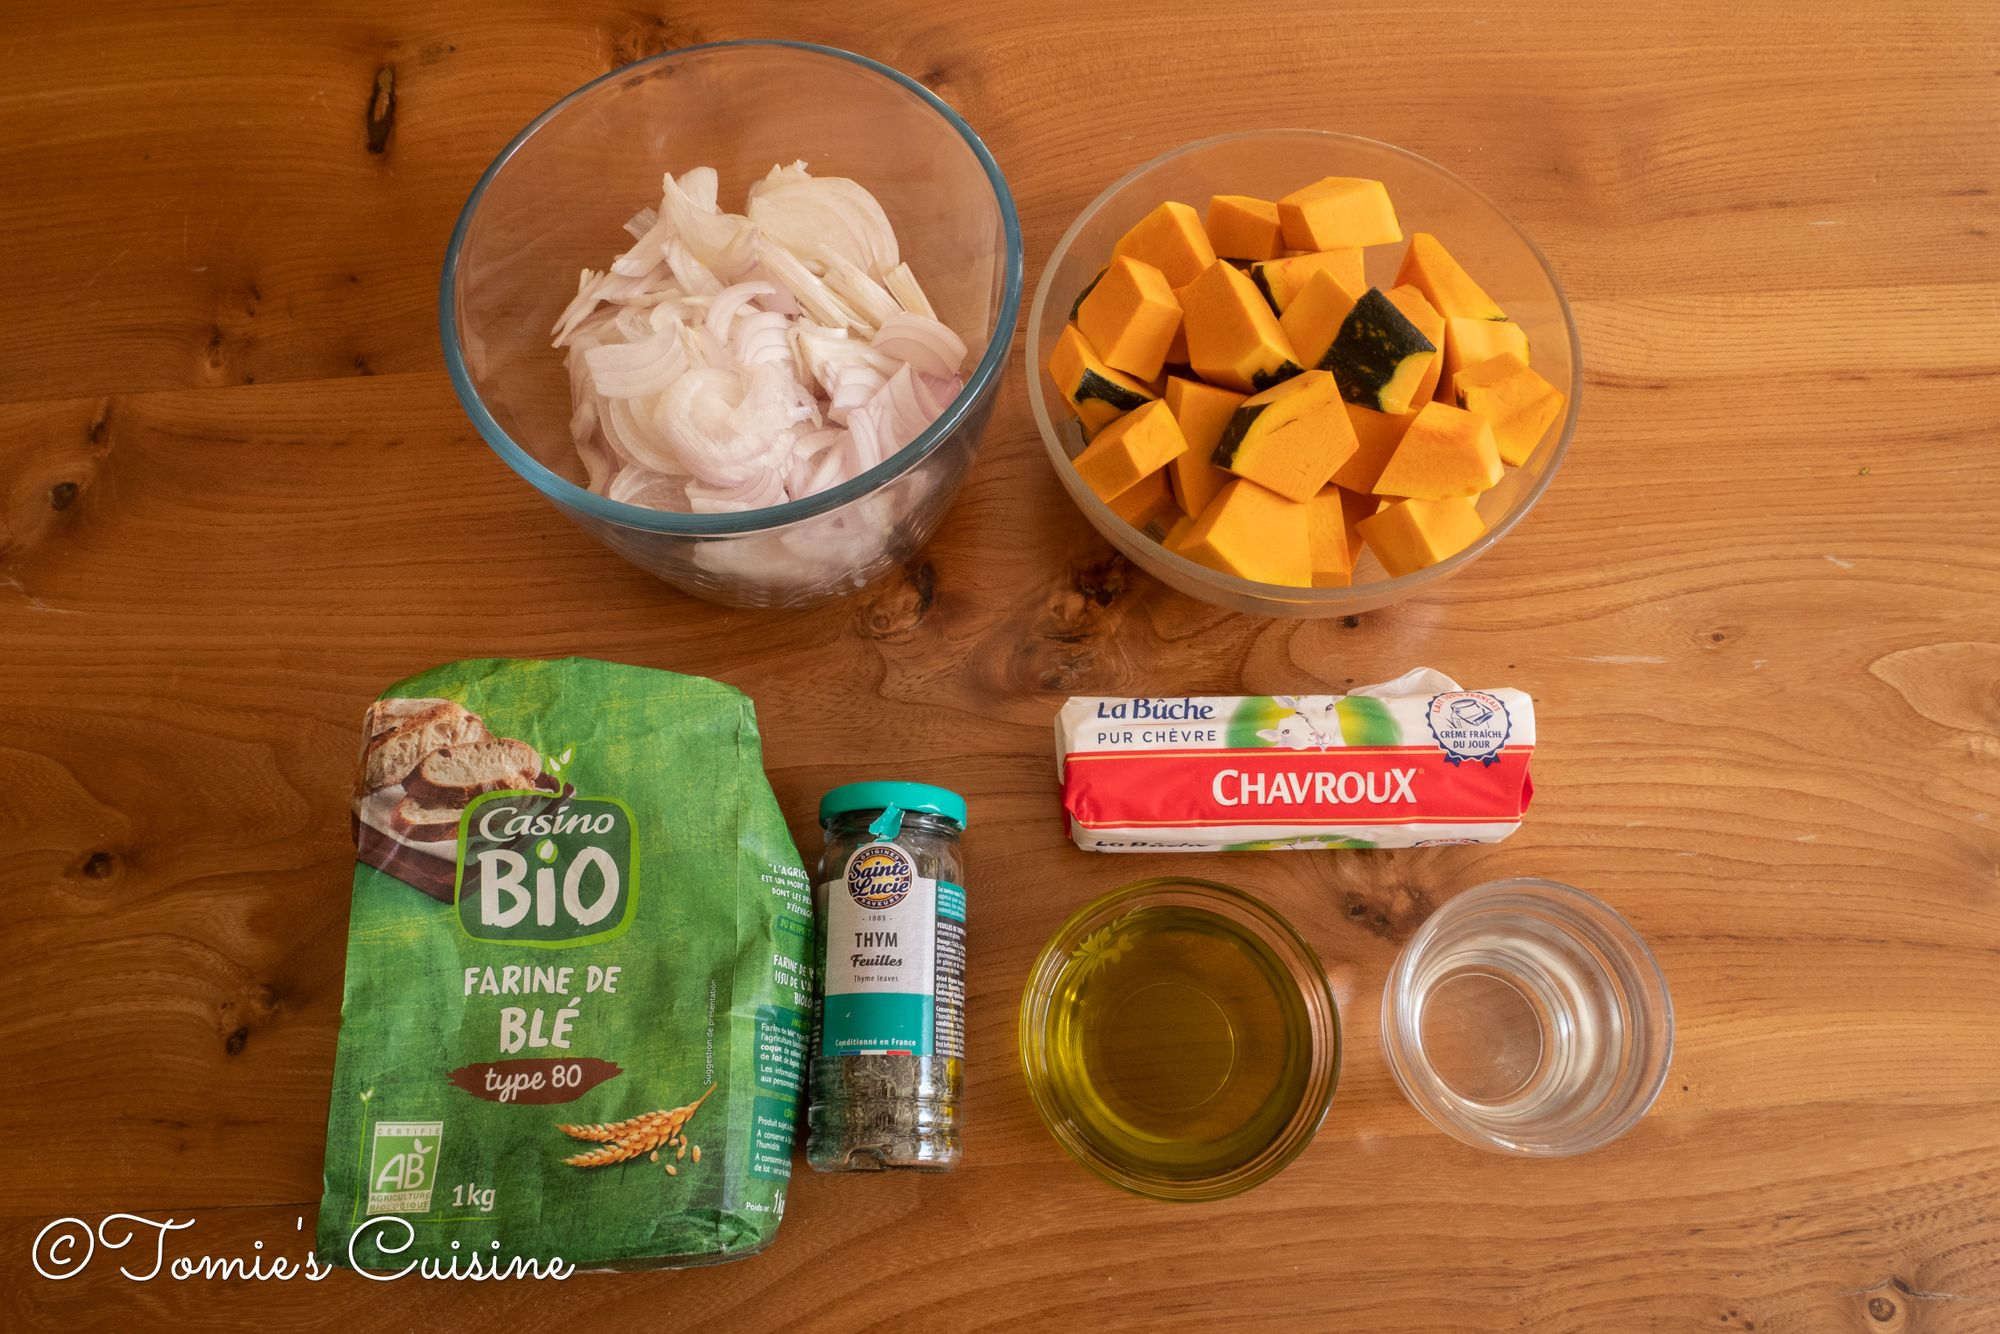 Our pumpkin tart ingredients